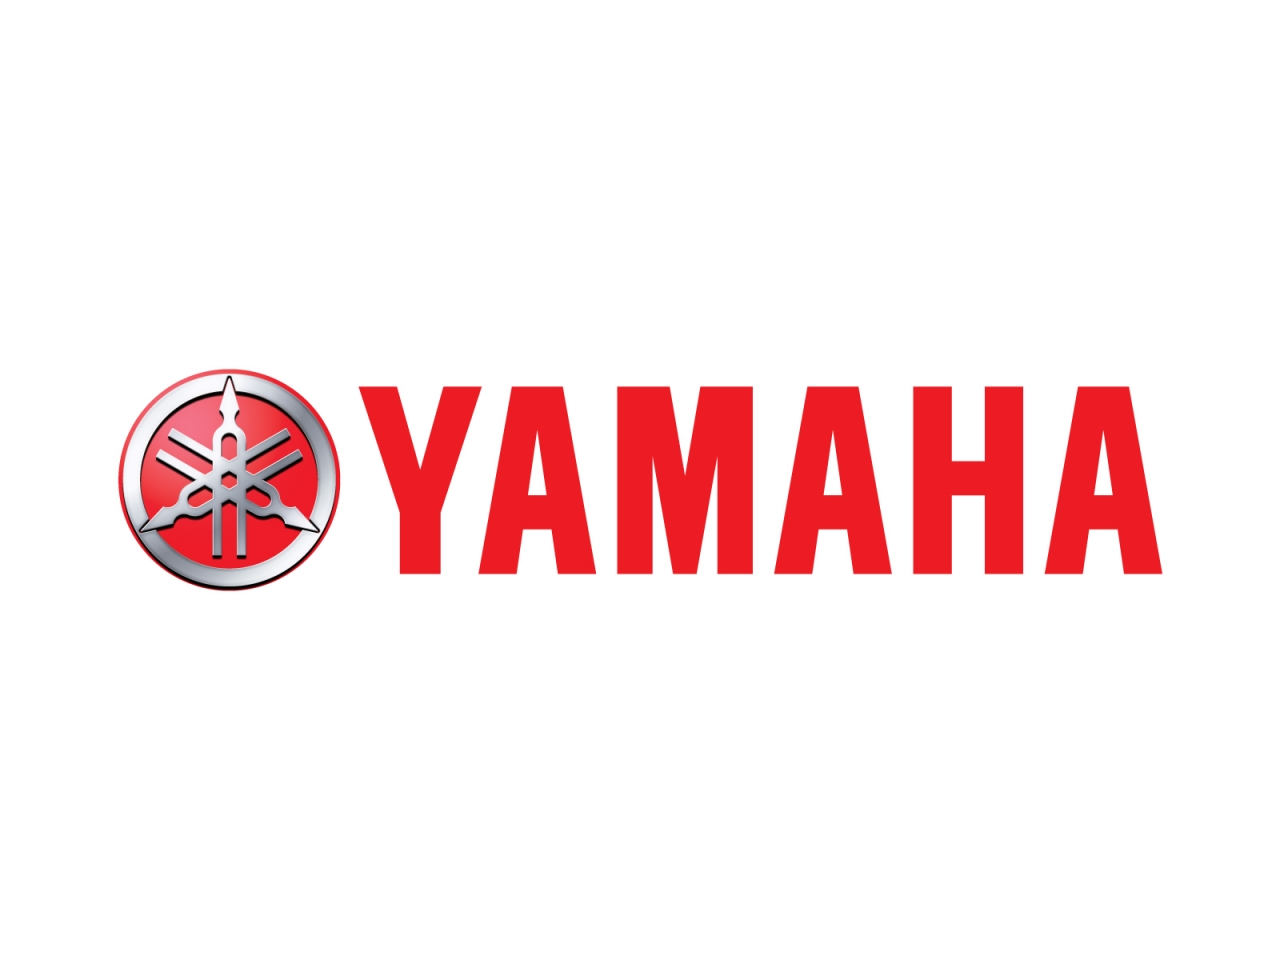 Yamaha Logo Wallpaper Yamaha Motor Australia 1280x960